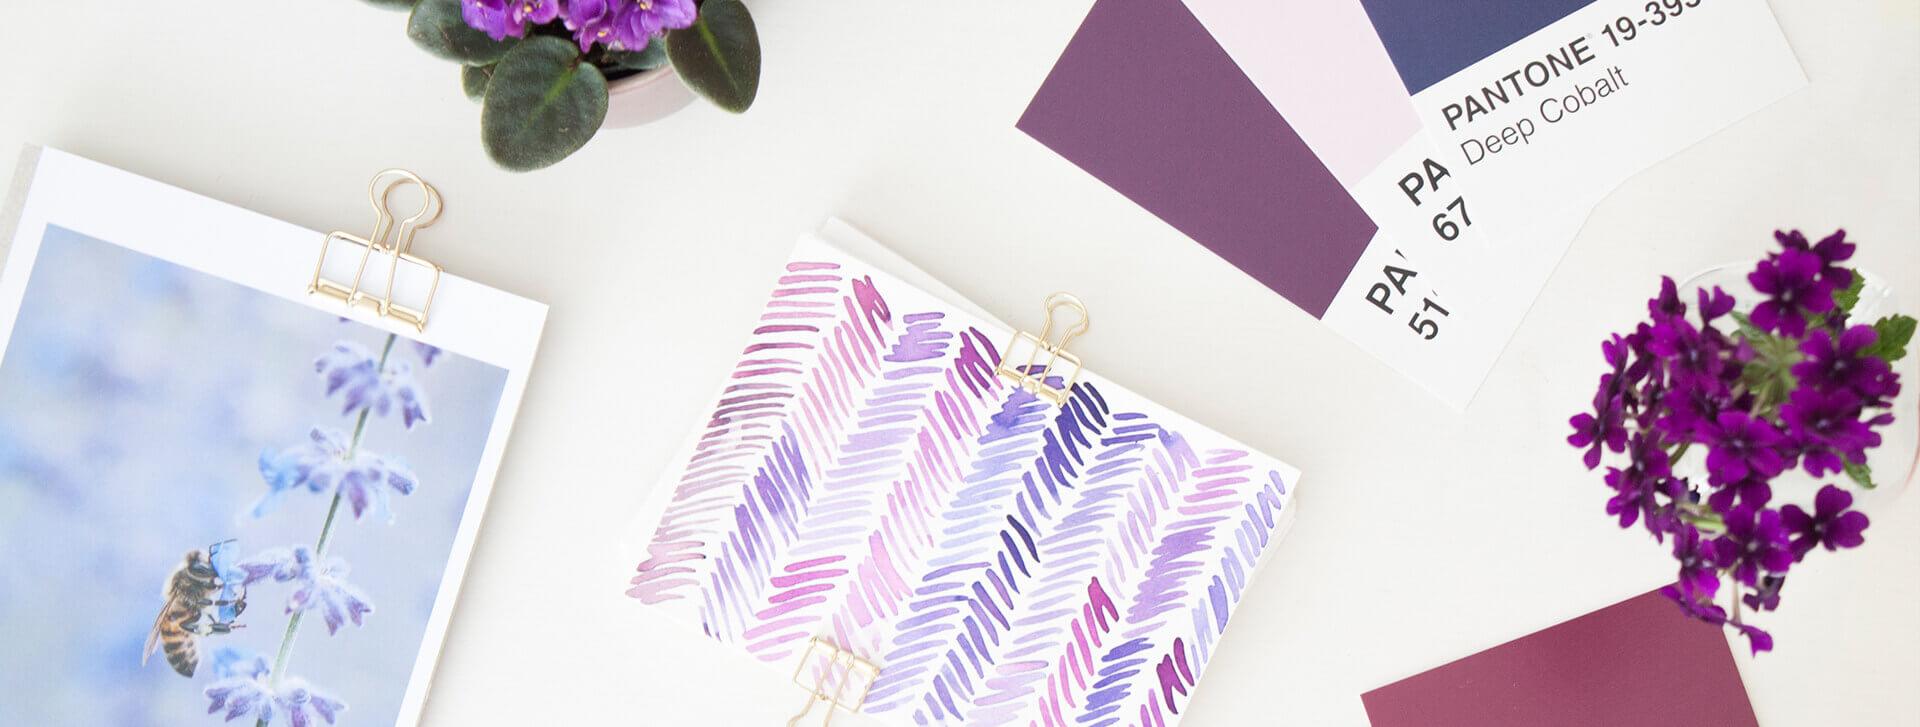 Violett im Branding